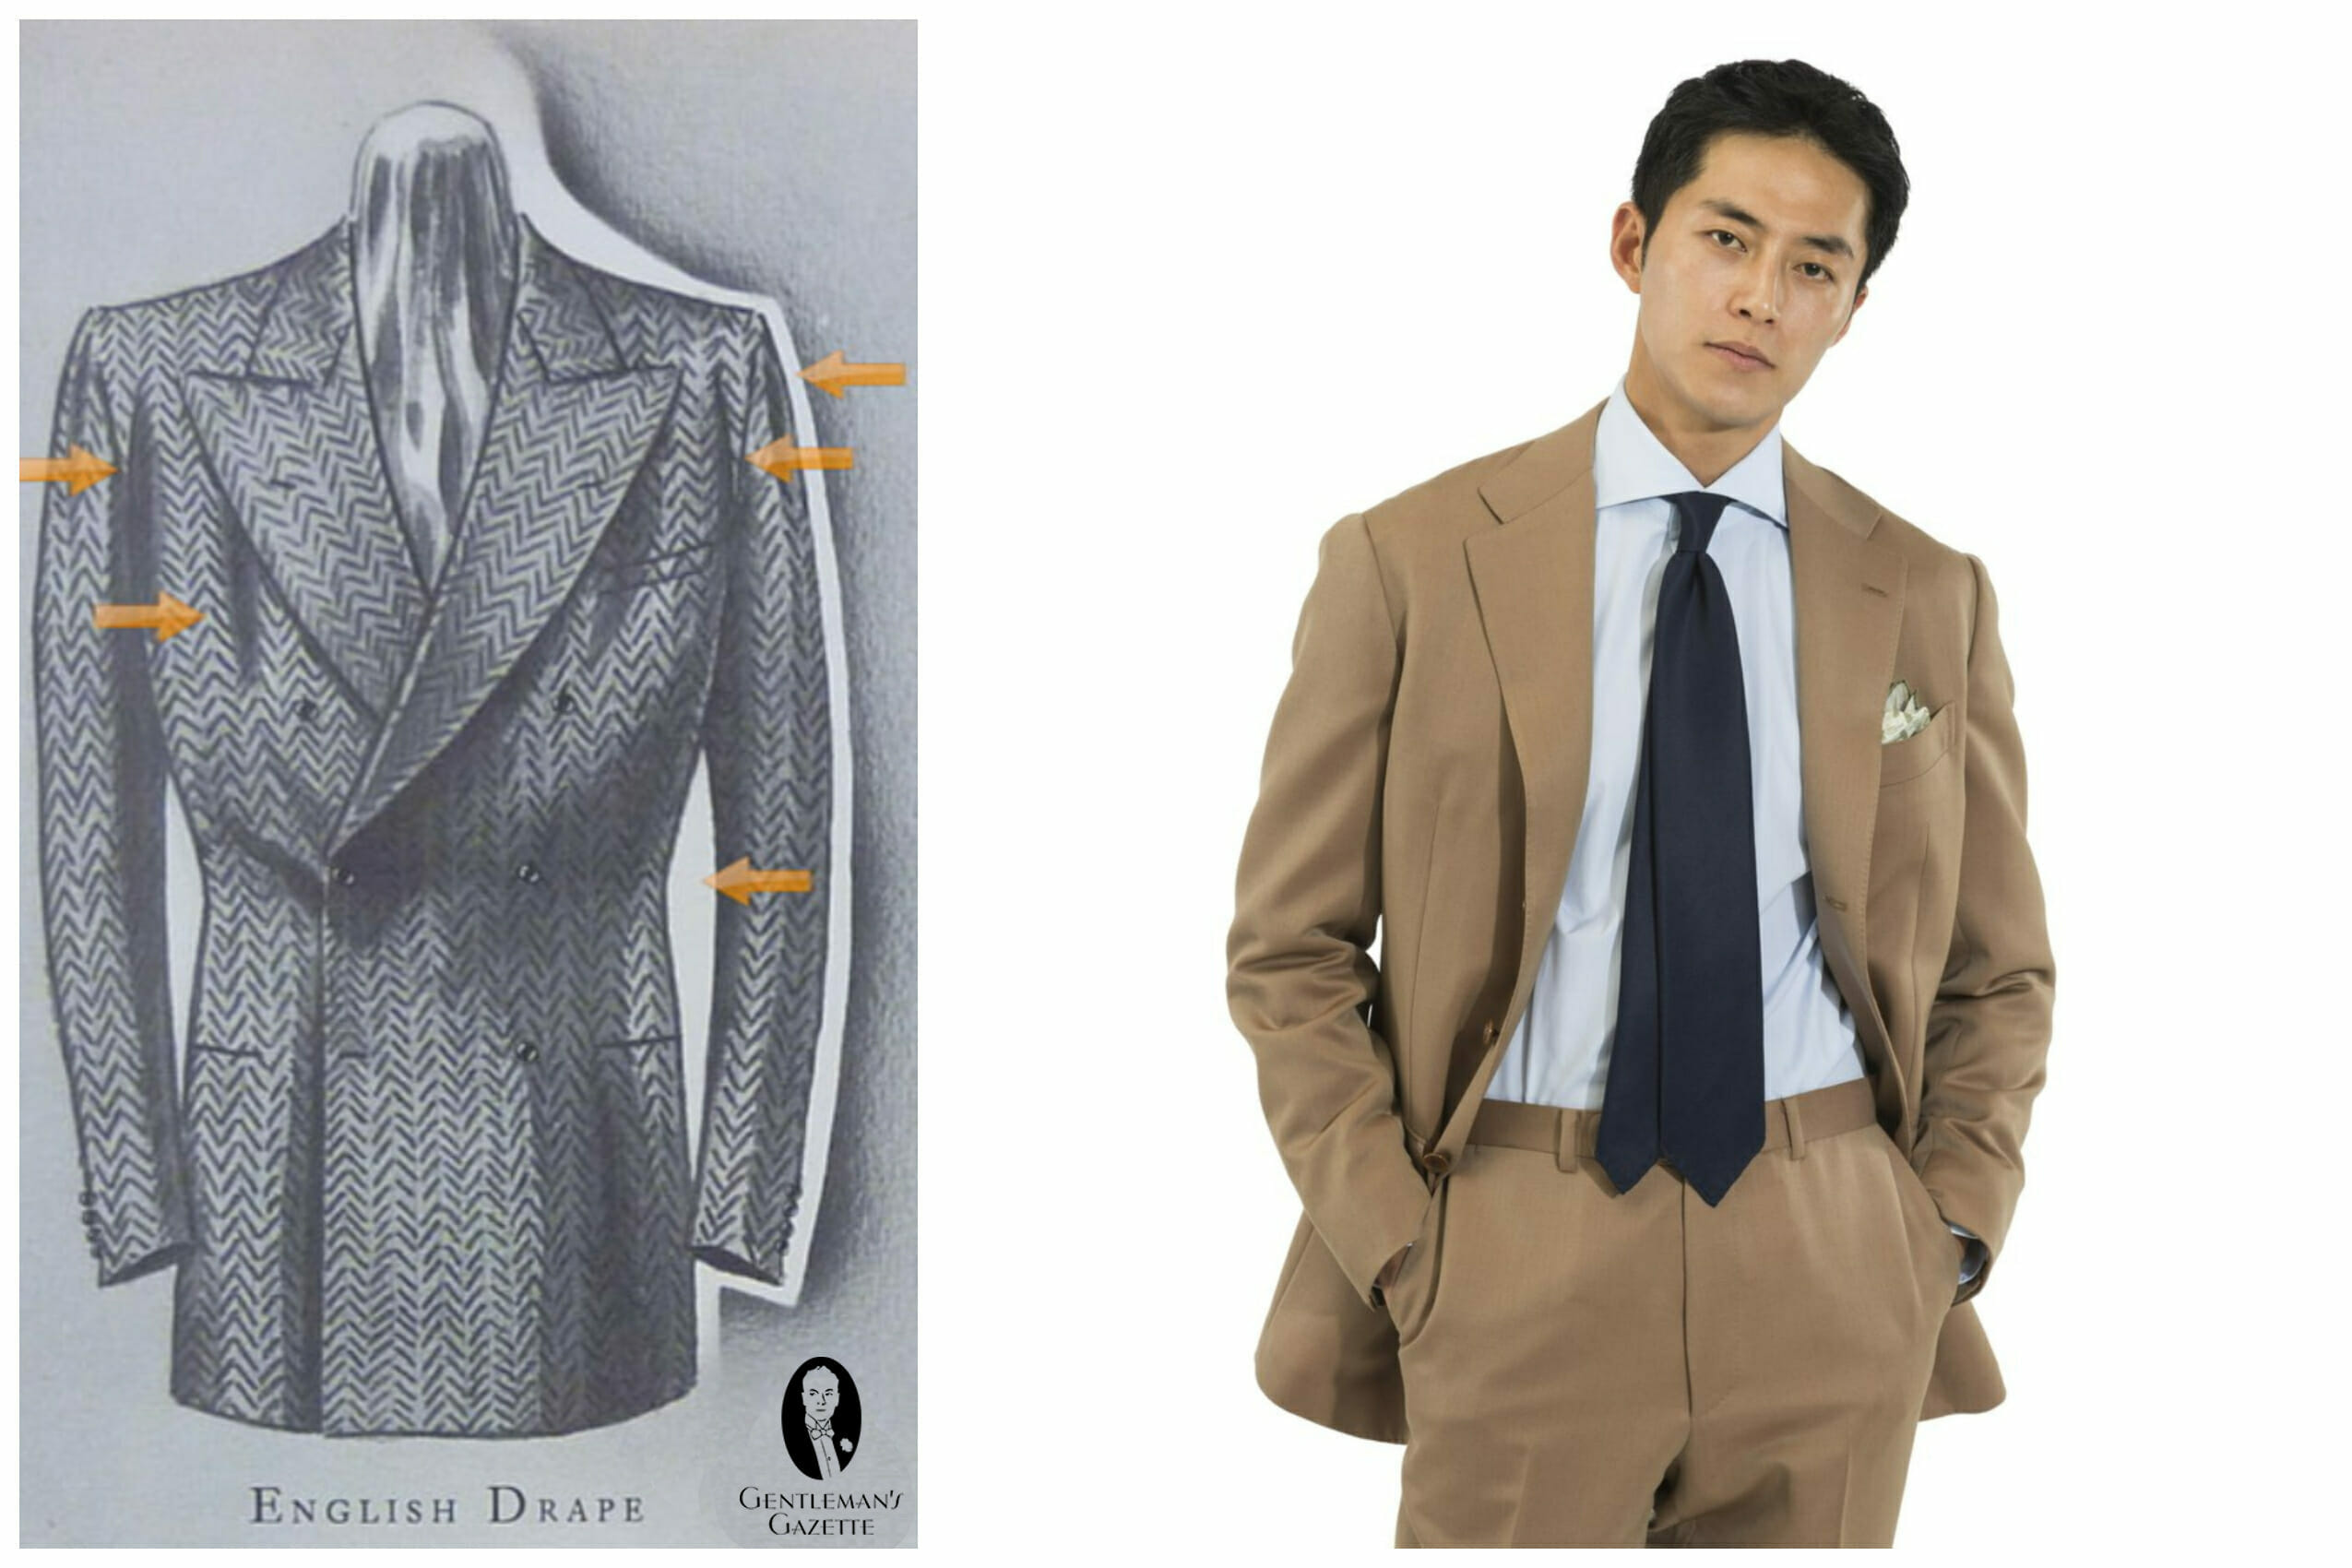 British Vs Italian Vs American Suit Fashions Silhouettes